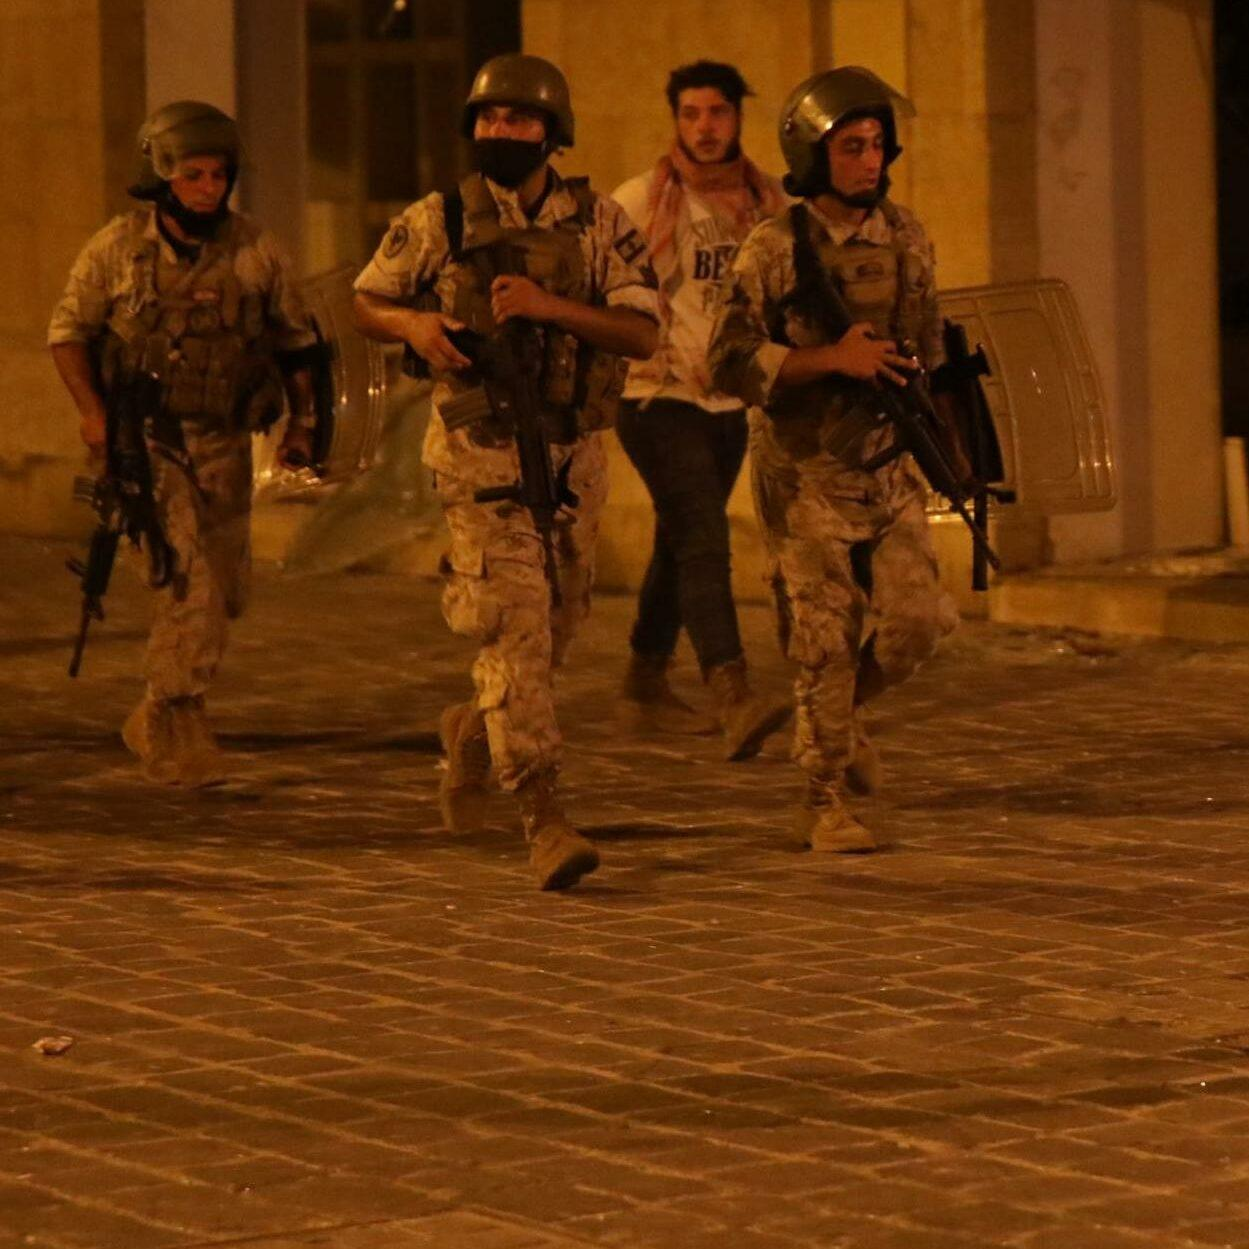 protestos no Líbano após explosões